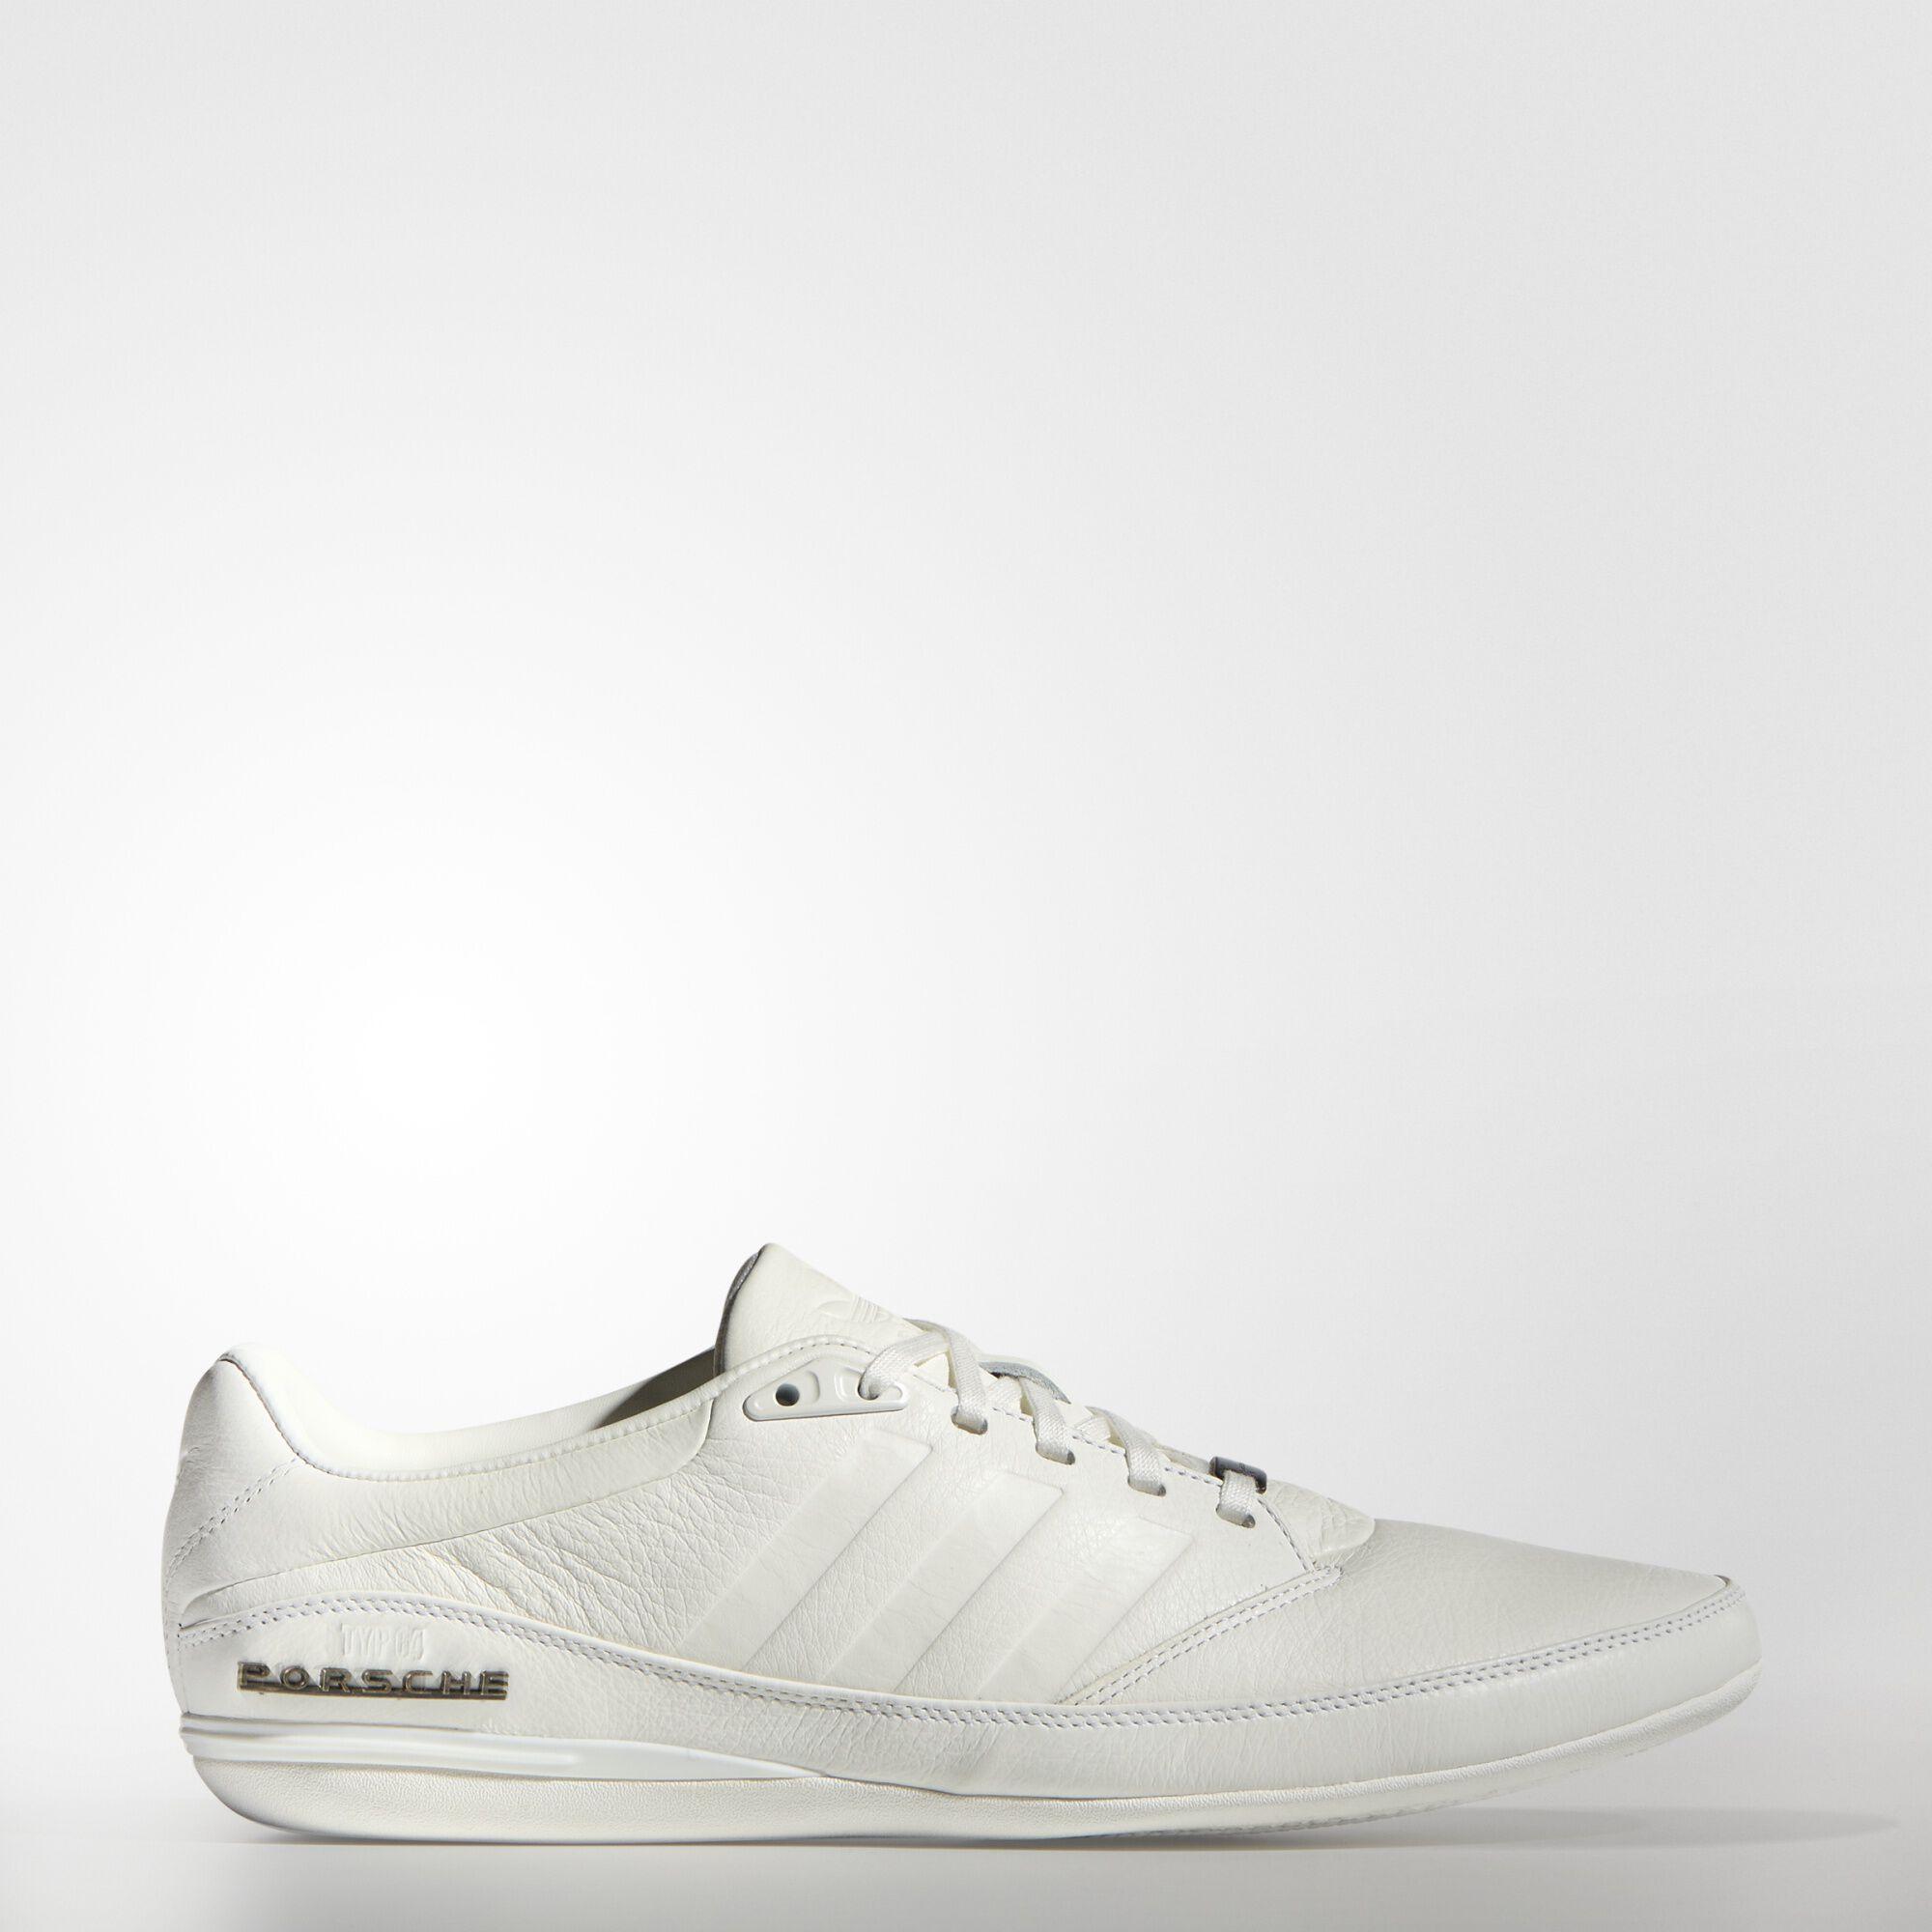 outlet scarpe adidas lissone